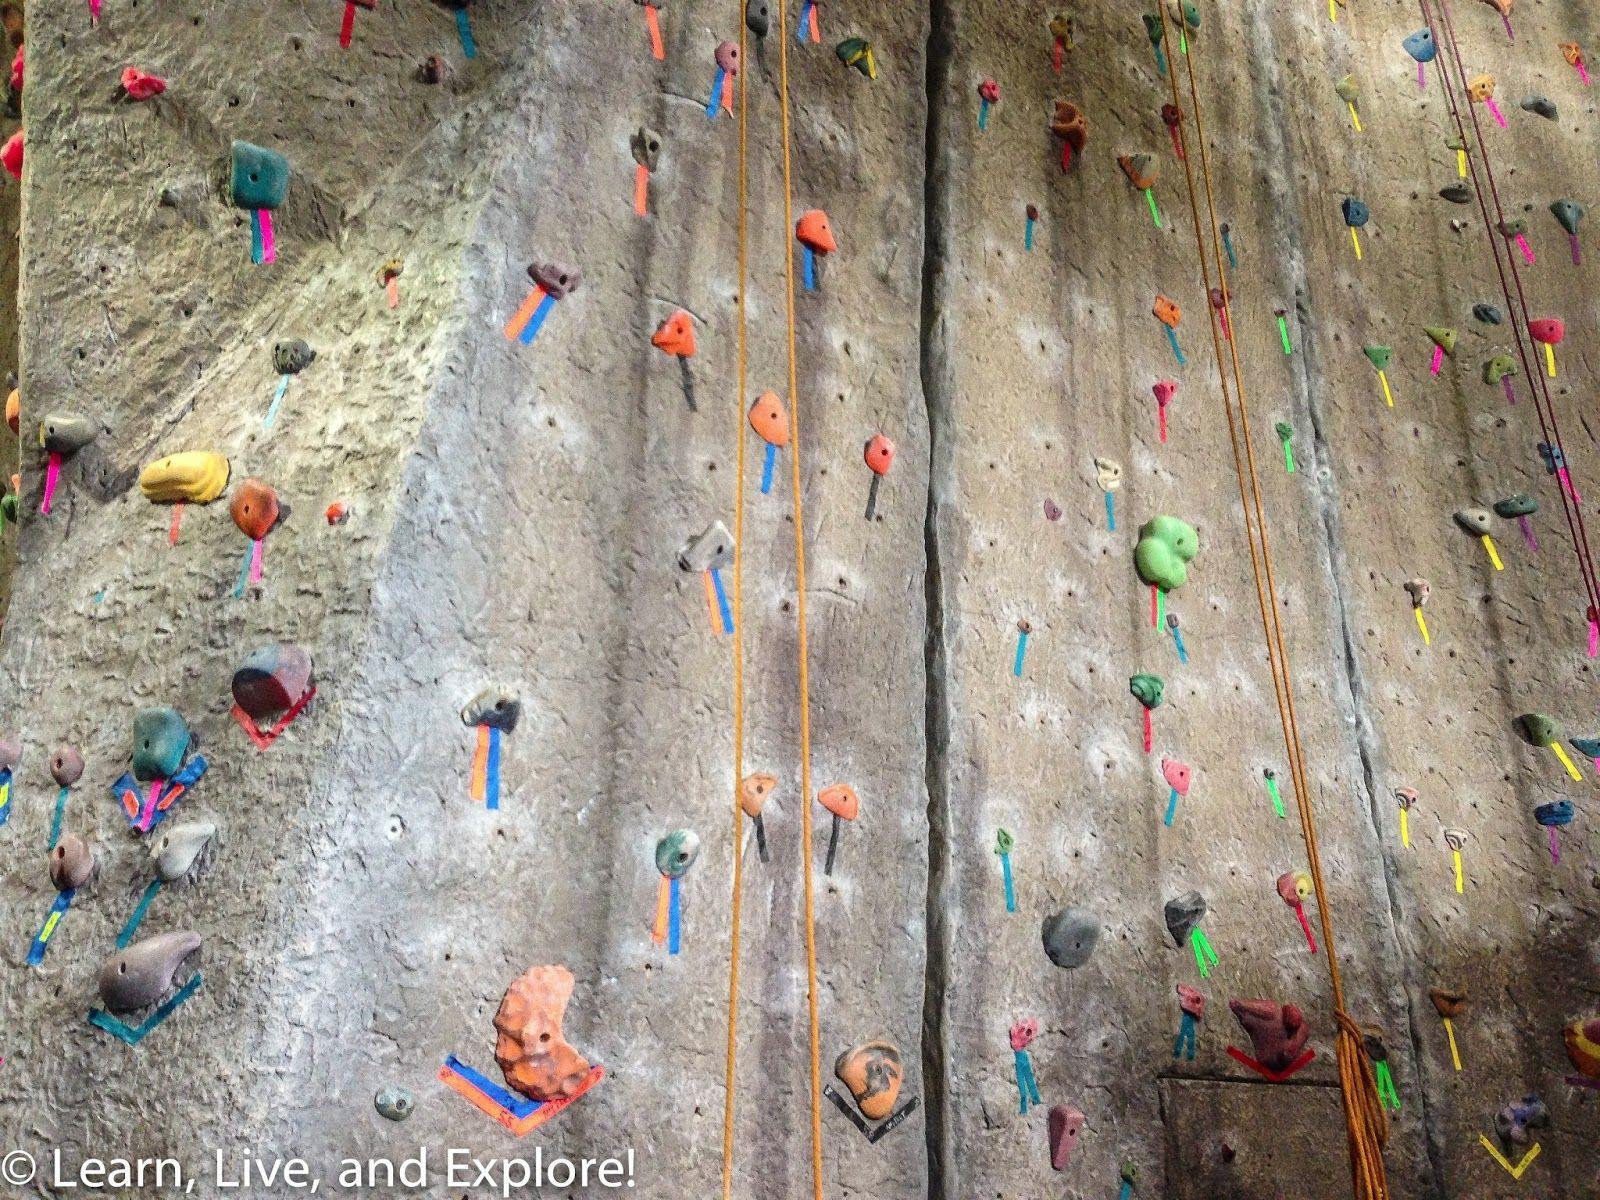 Climbing Wallpapers - Wallpaper Cave